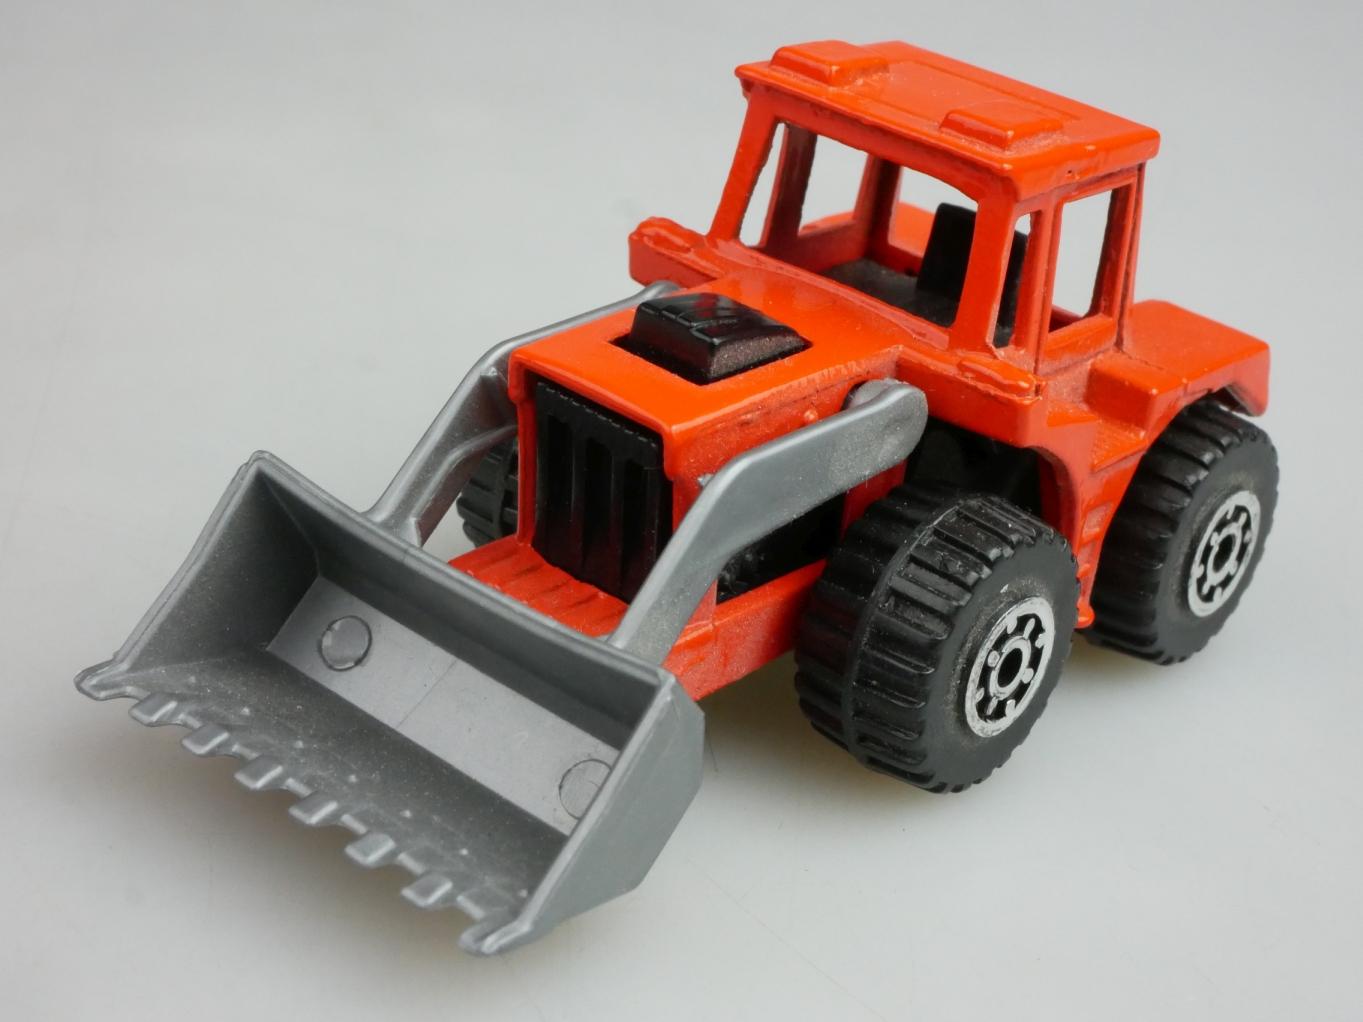 Tractor Shovel (29-C) - 68633